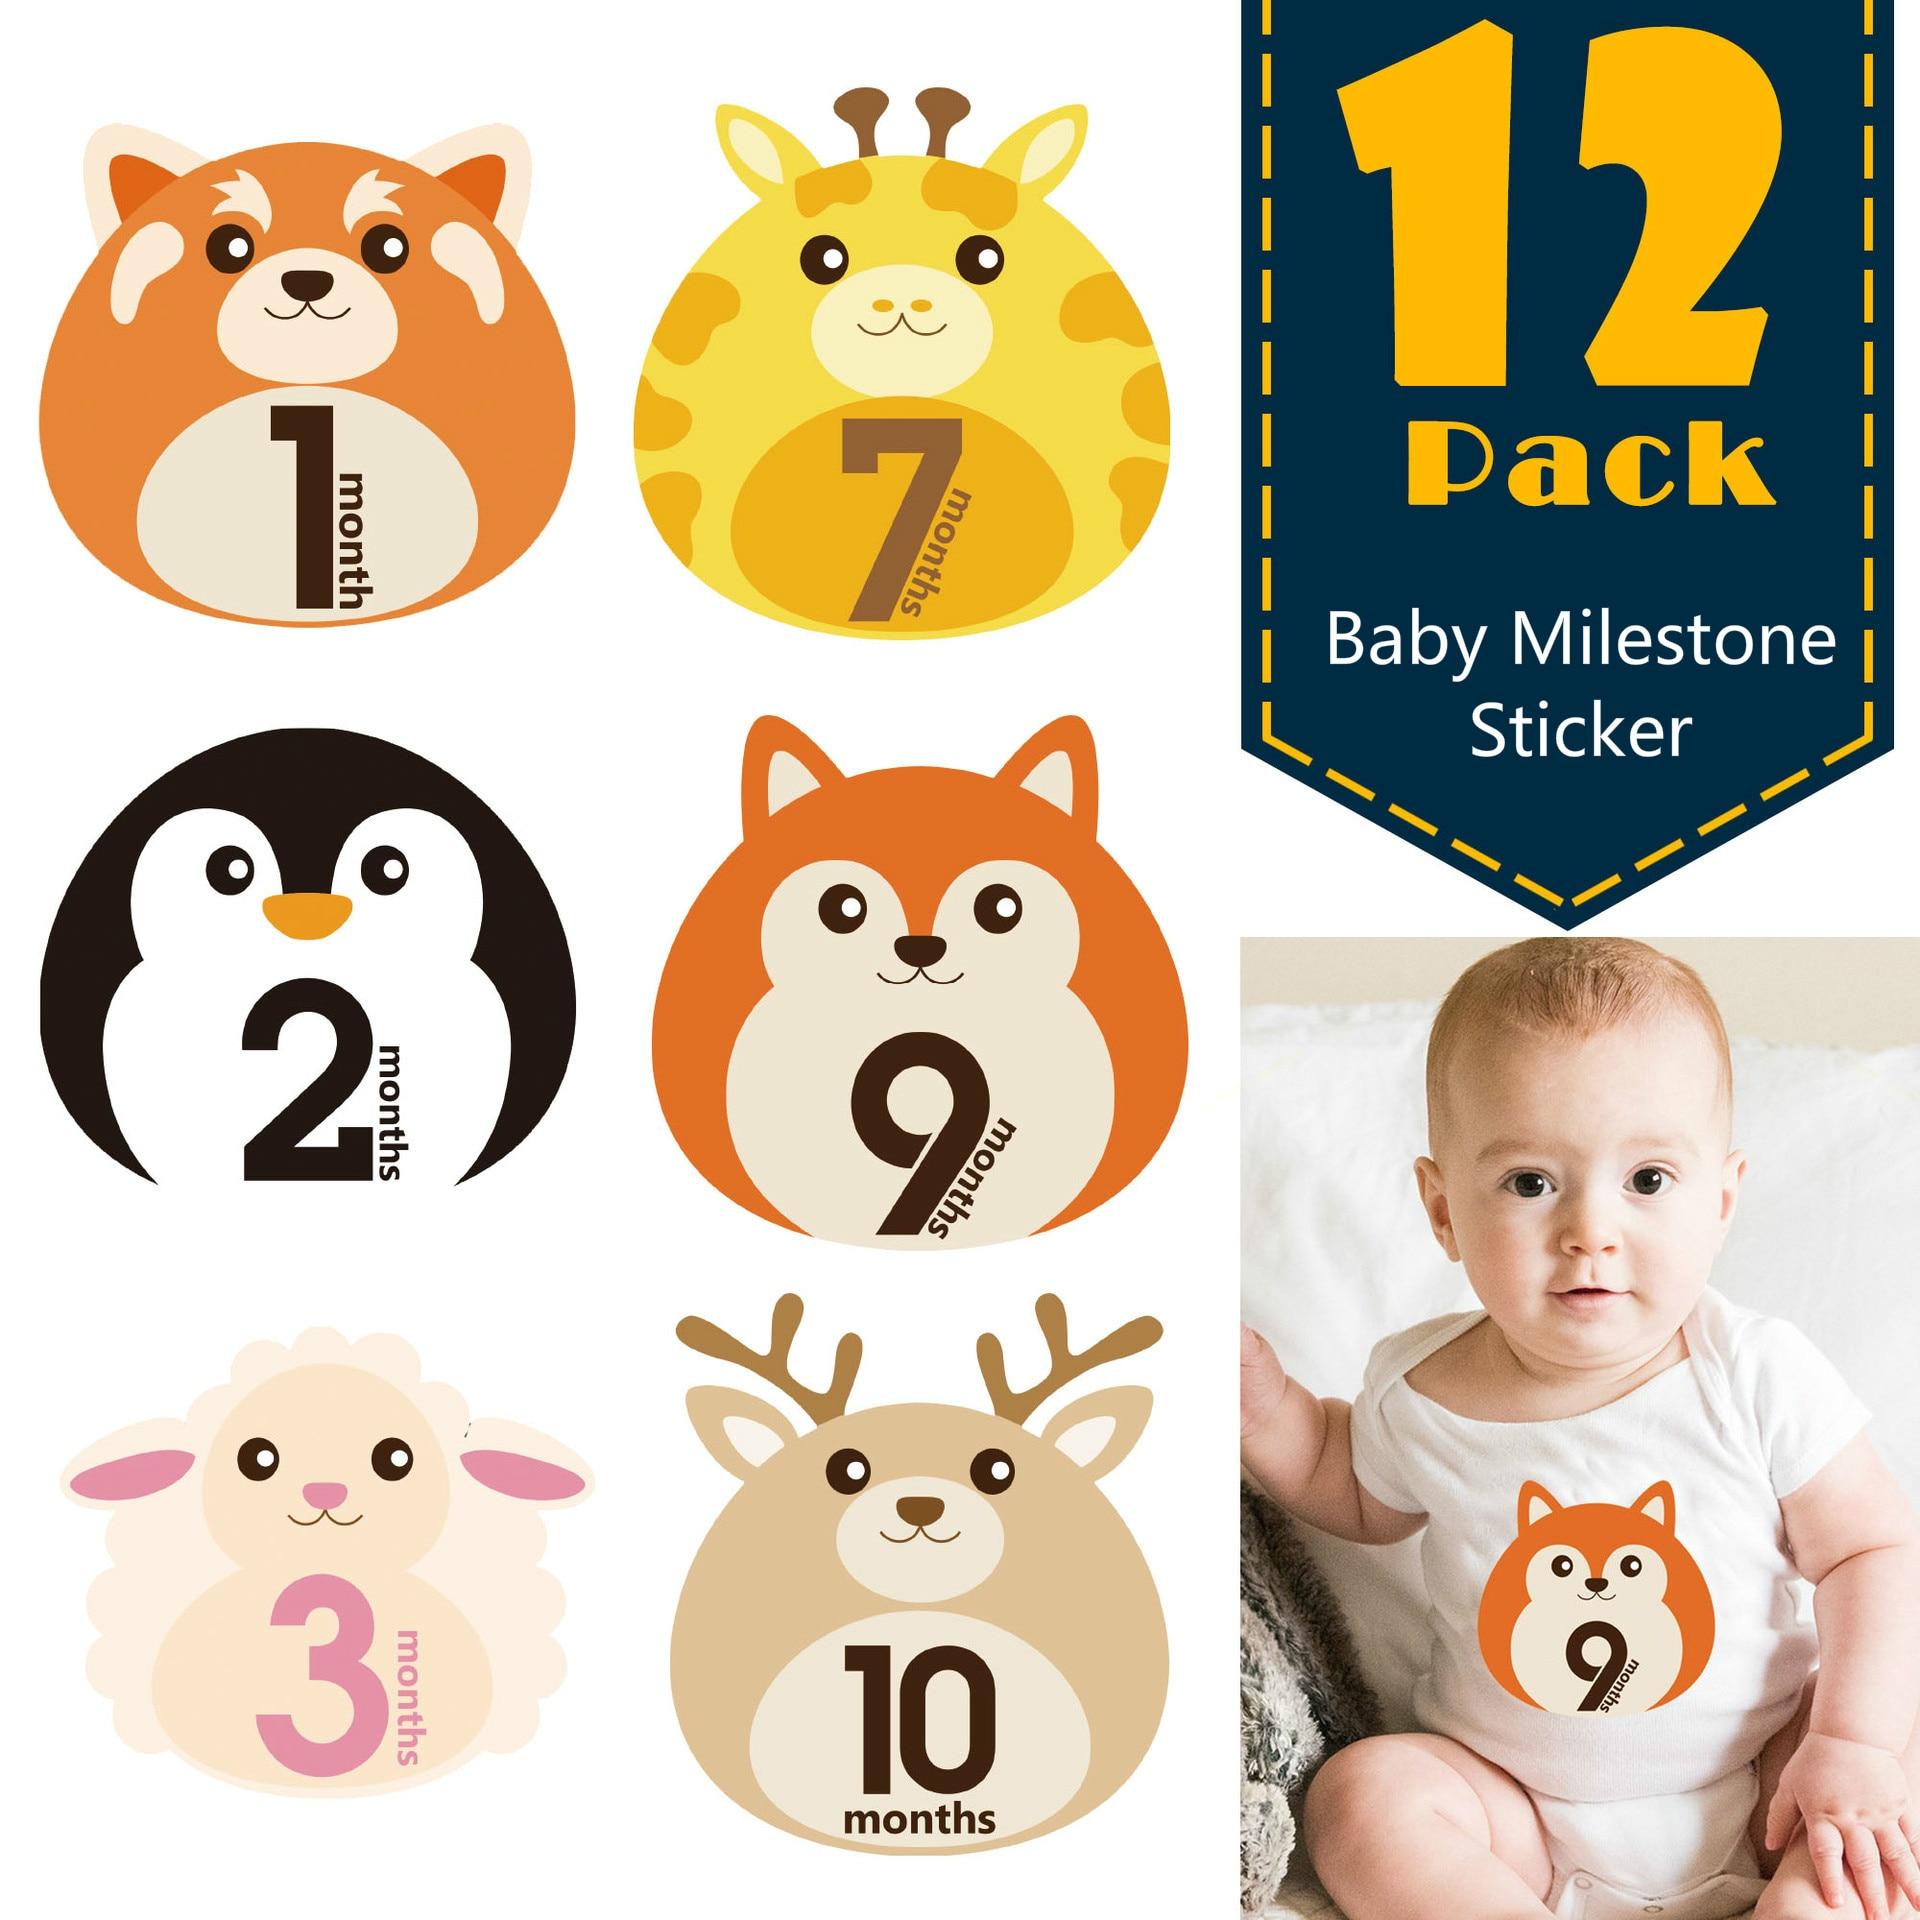 New Cartoon Animal Baby Monthly Photograph Stickers 12Pcs/set Newborn DIY Scrapbook Album Photo Prop For 0-12 Month Toddler Baby